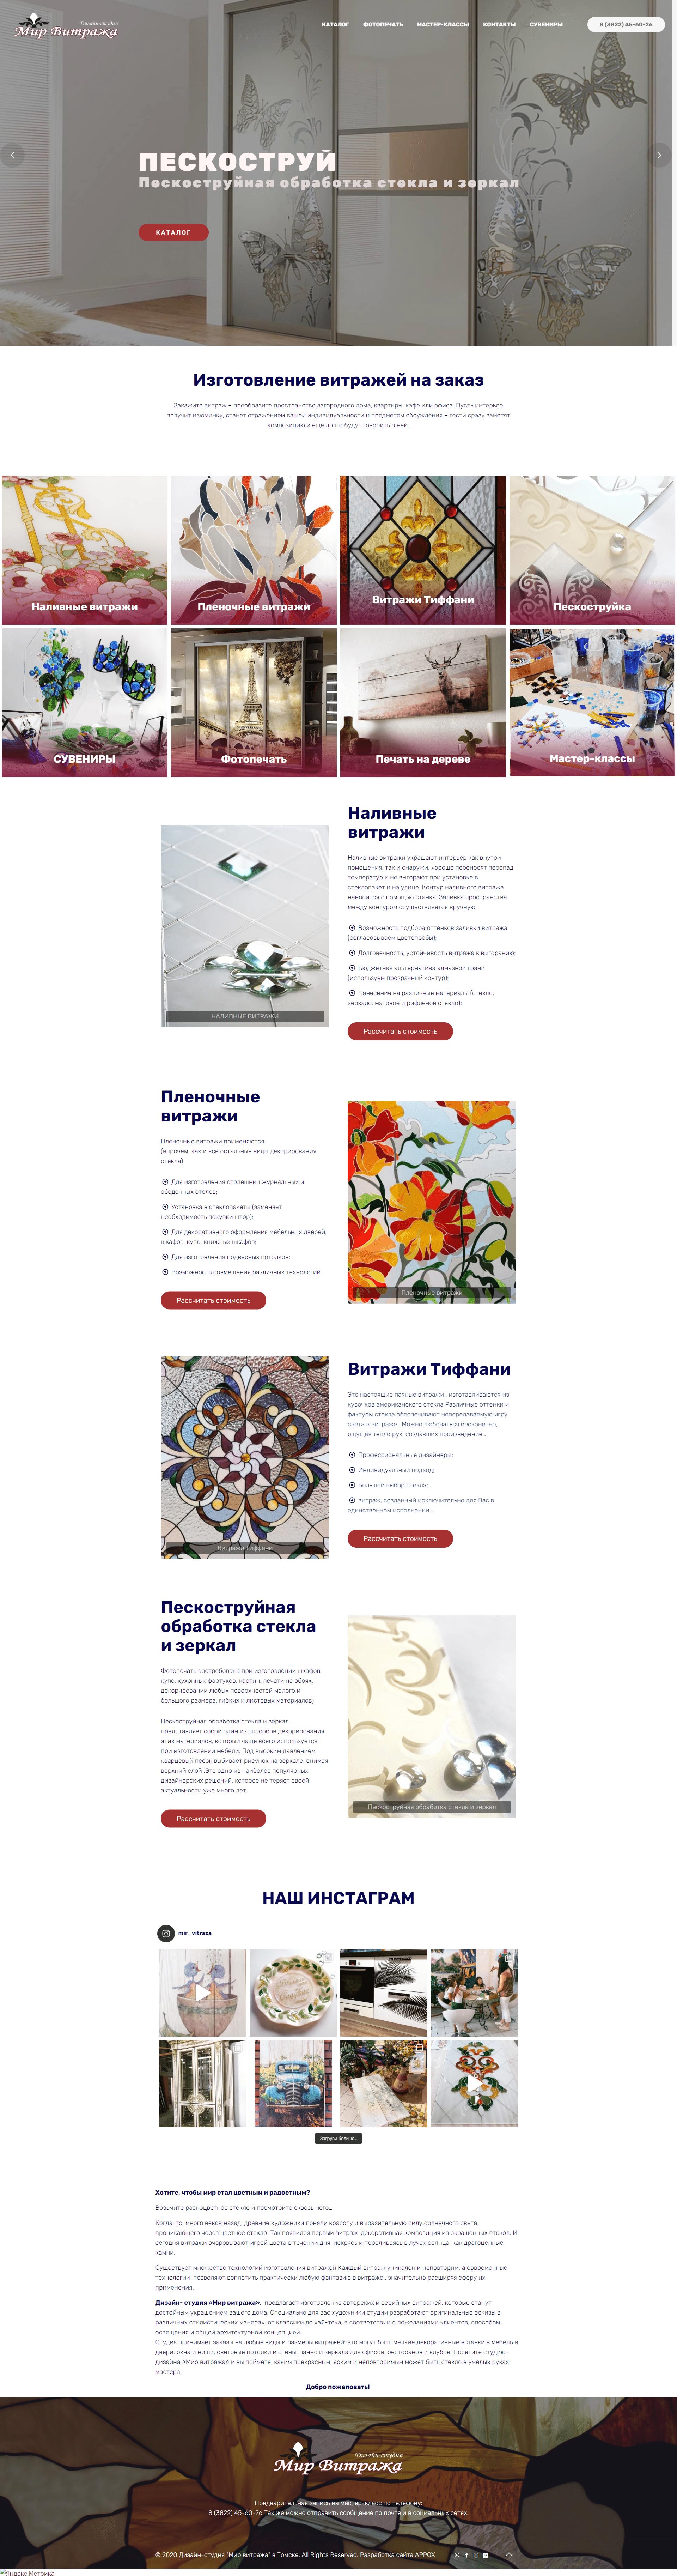 Mvdesign.tomsk.ru All